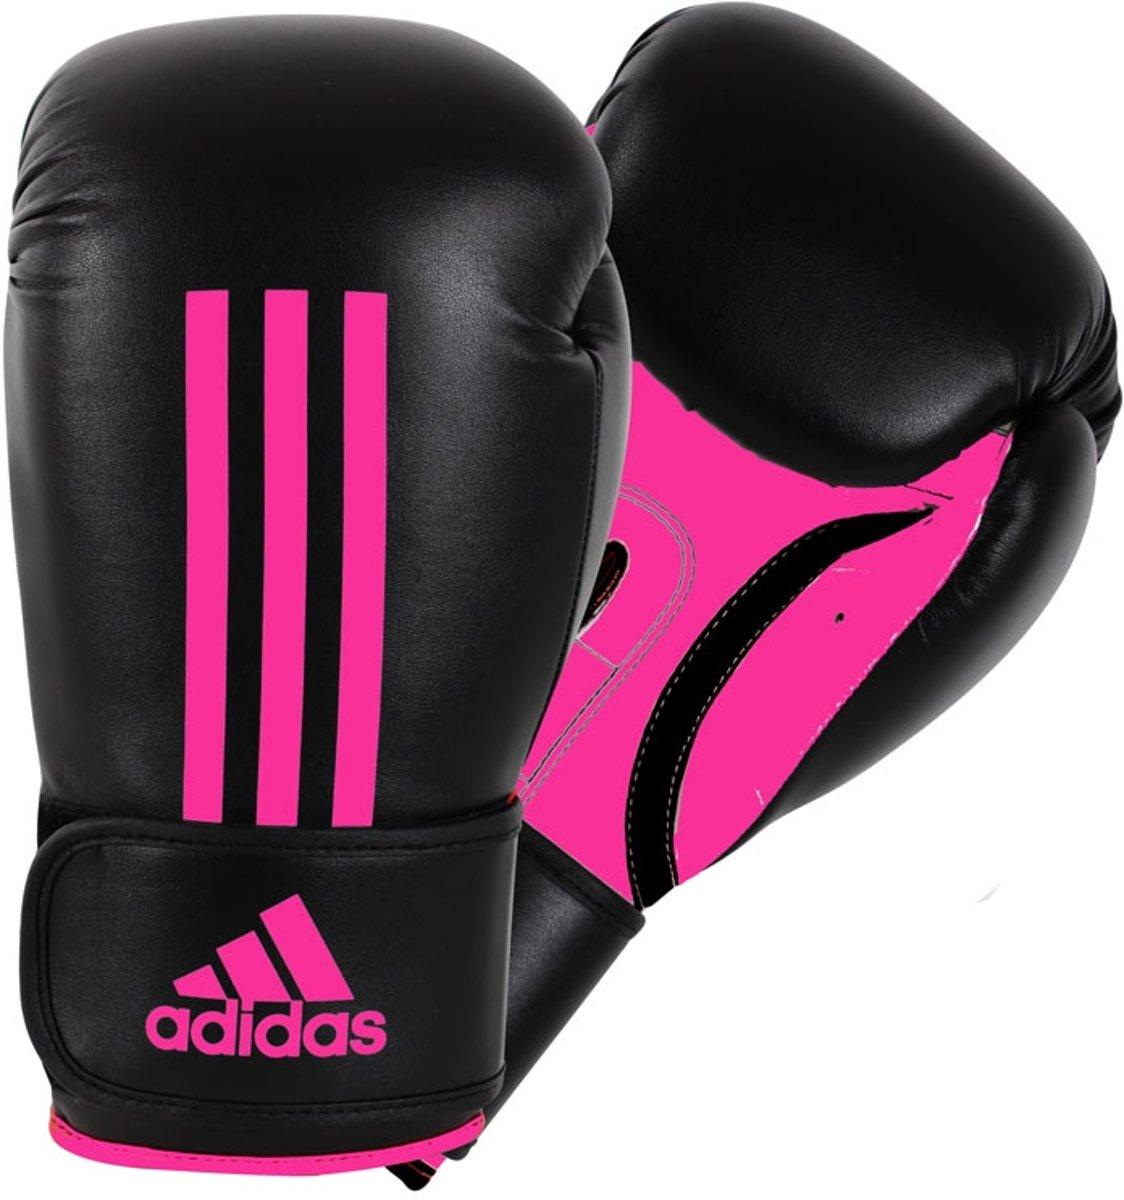 Adidas Energy 100 (Kick)Bokshandschoenen Rood-Wit - 16 oz